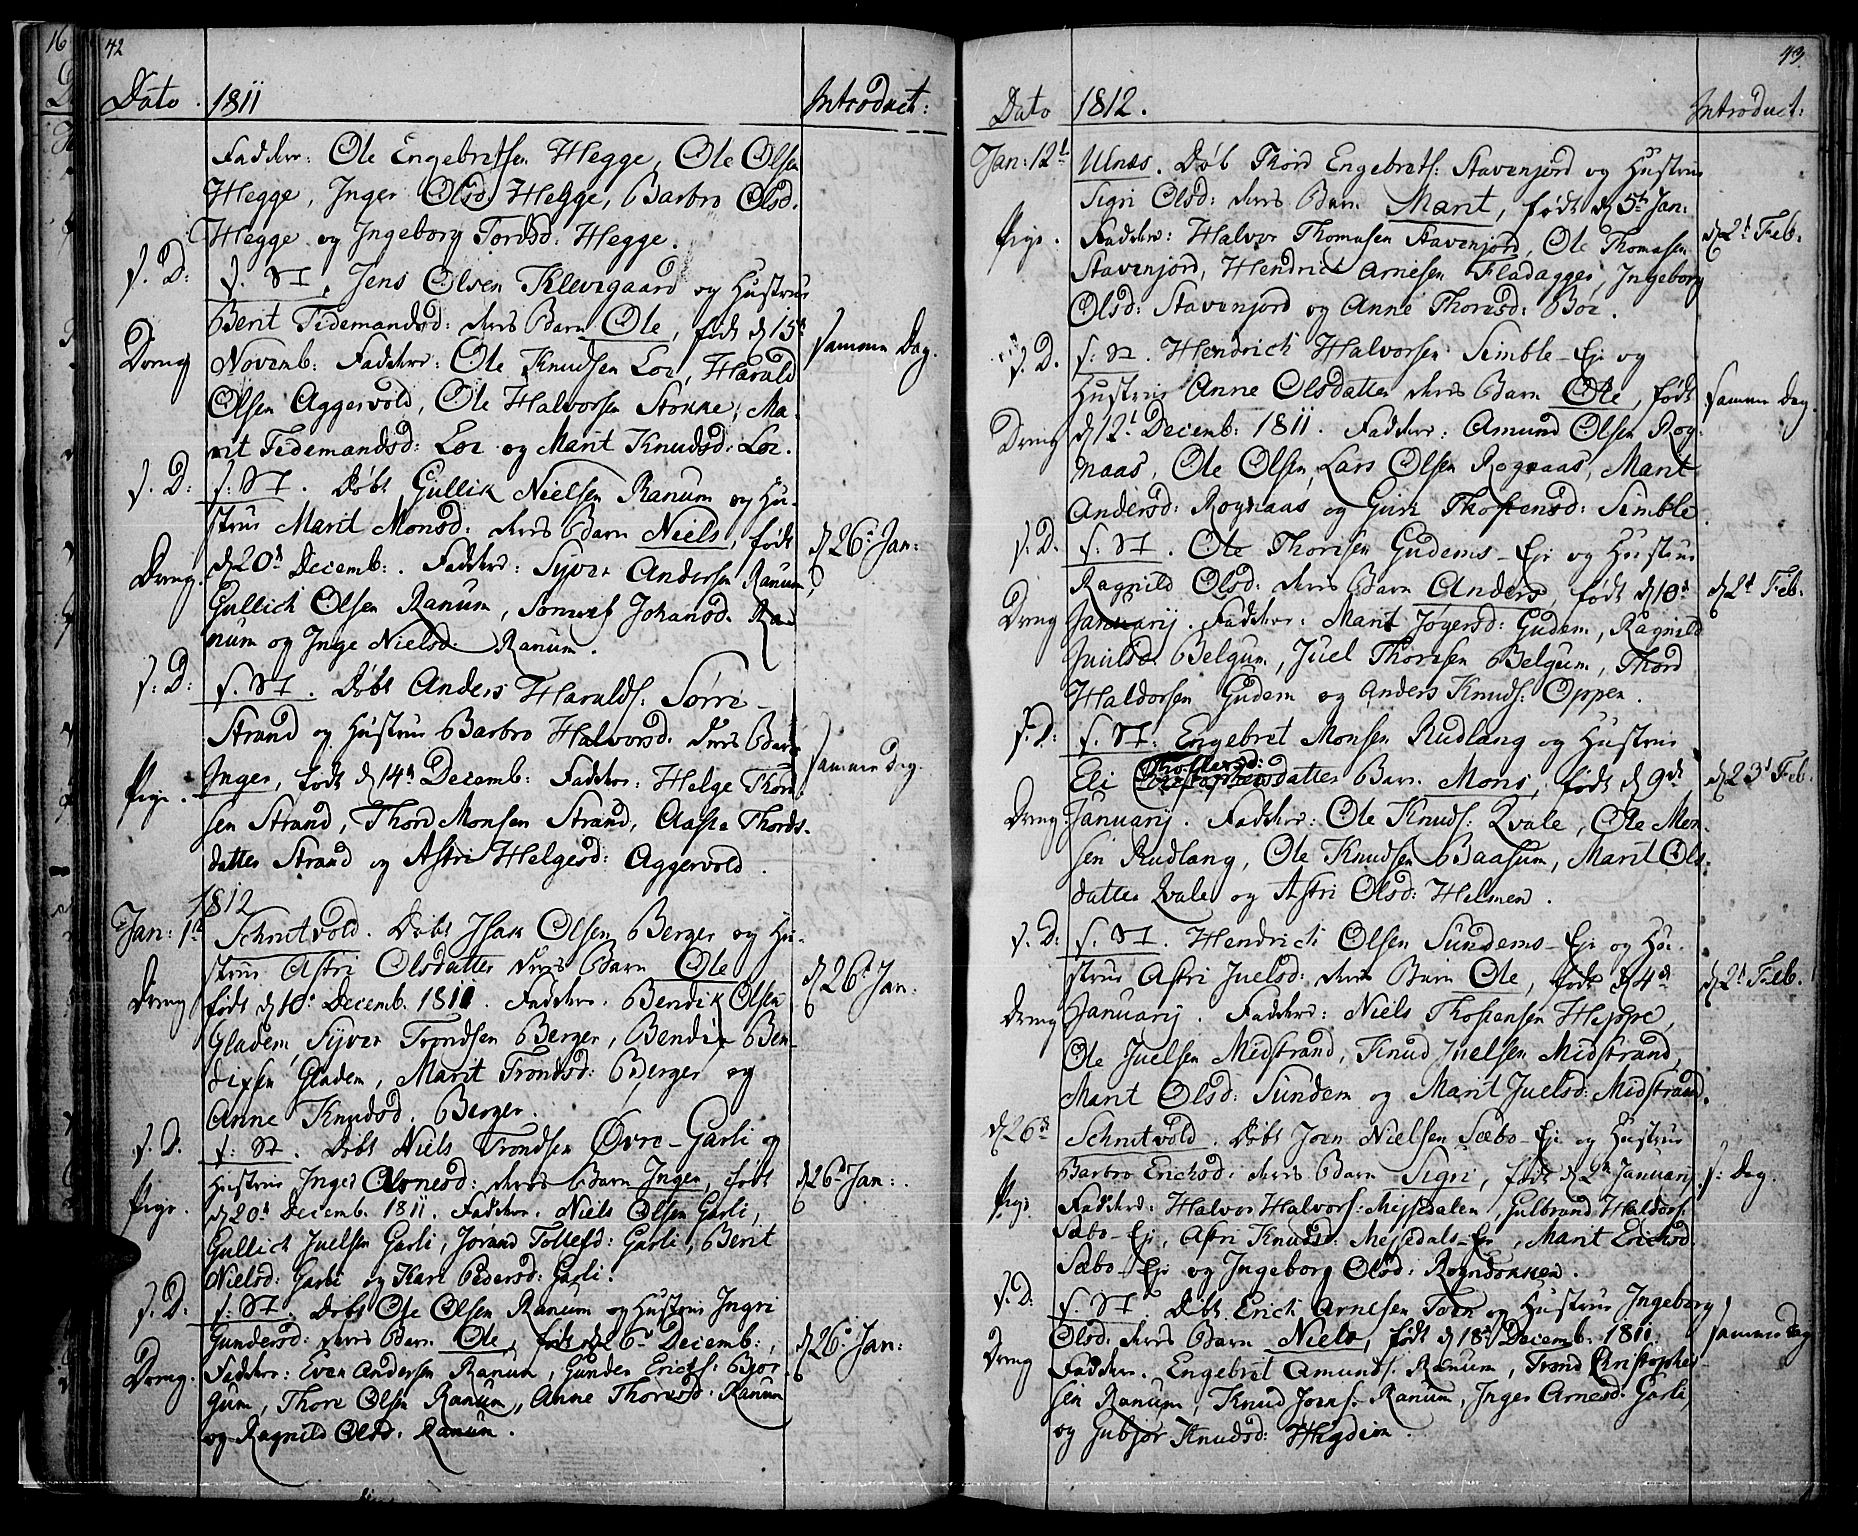 SAH, Nord-Aurdal prestekontor, Ministerialbok nr. 1, 1808-1815, s. 42-43